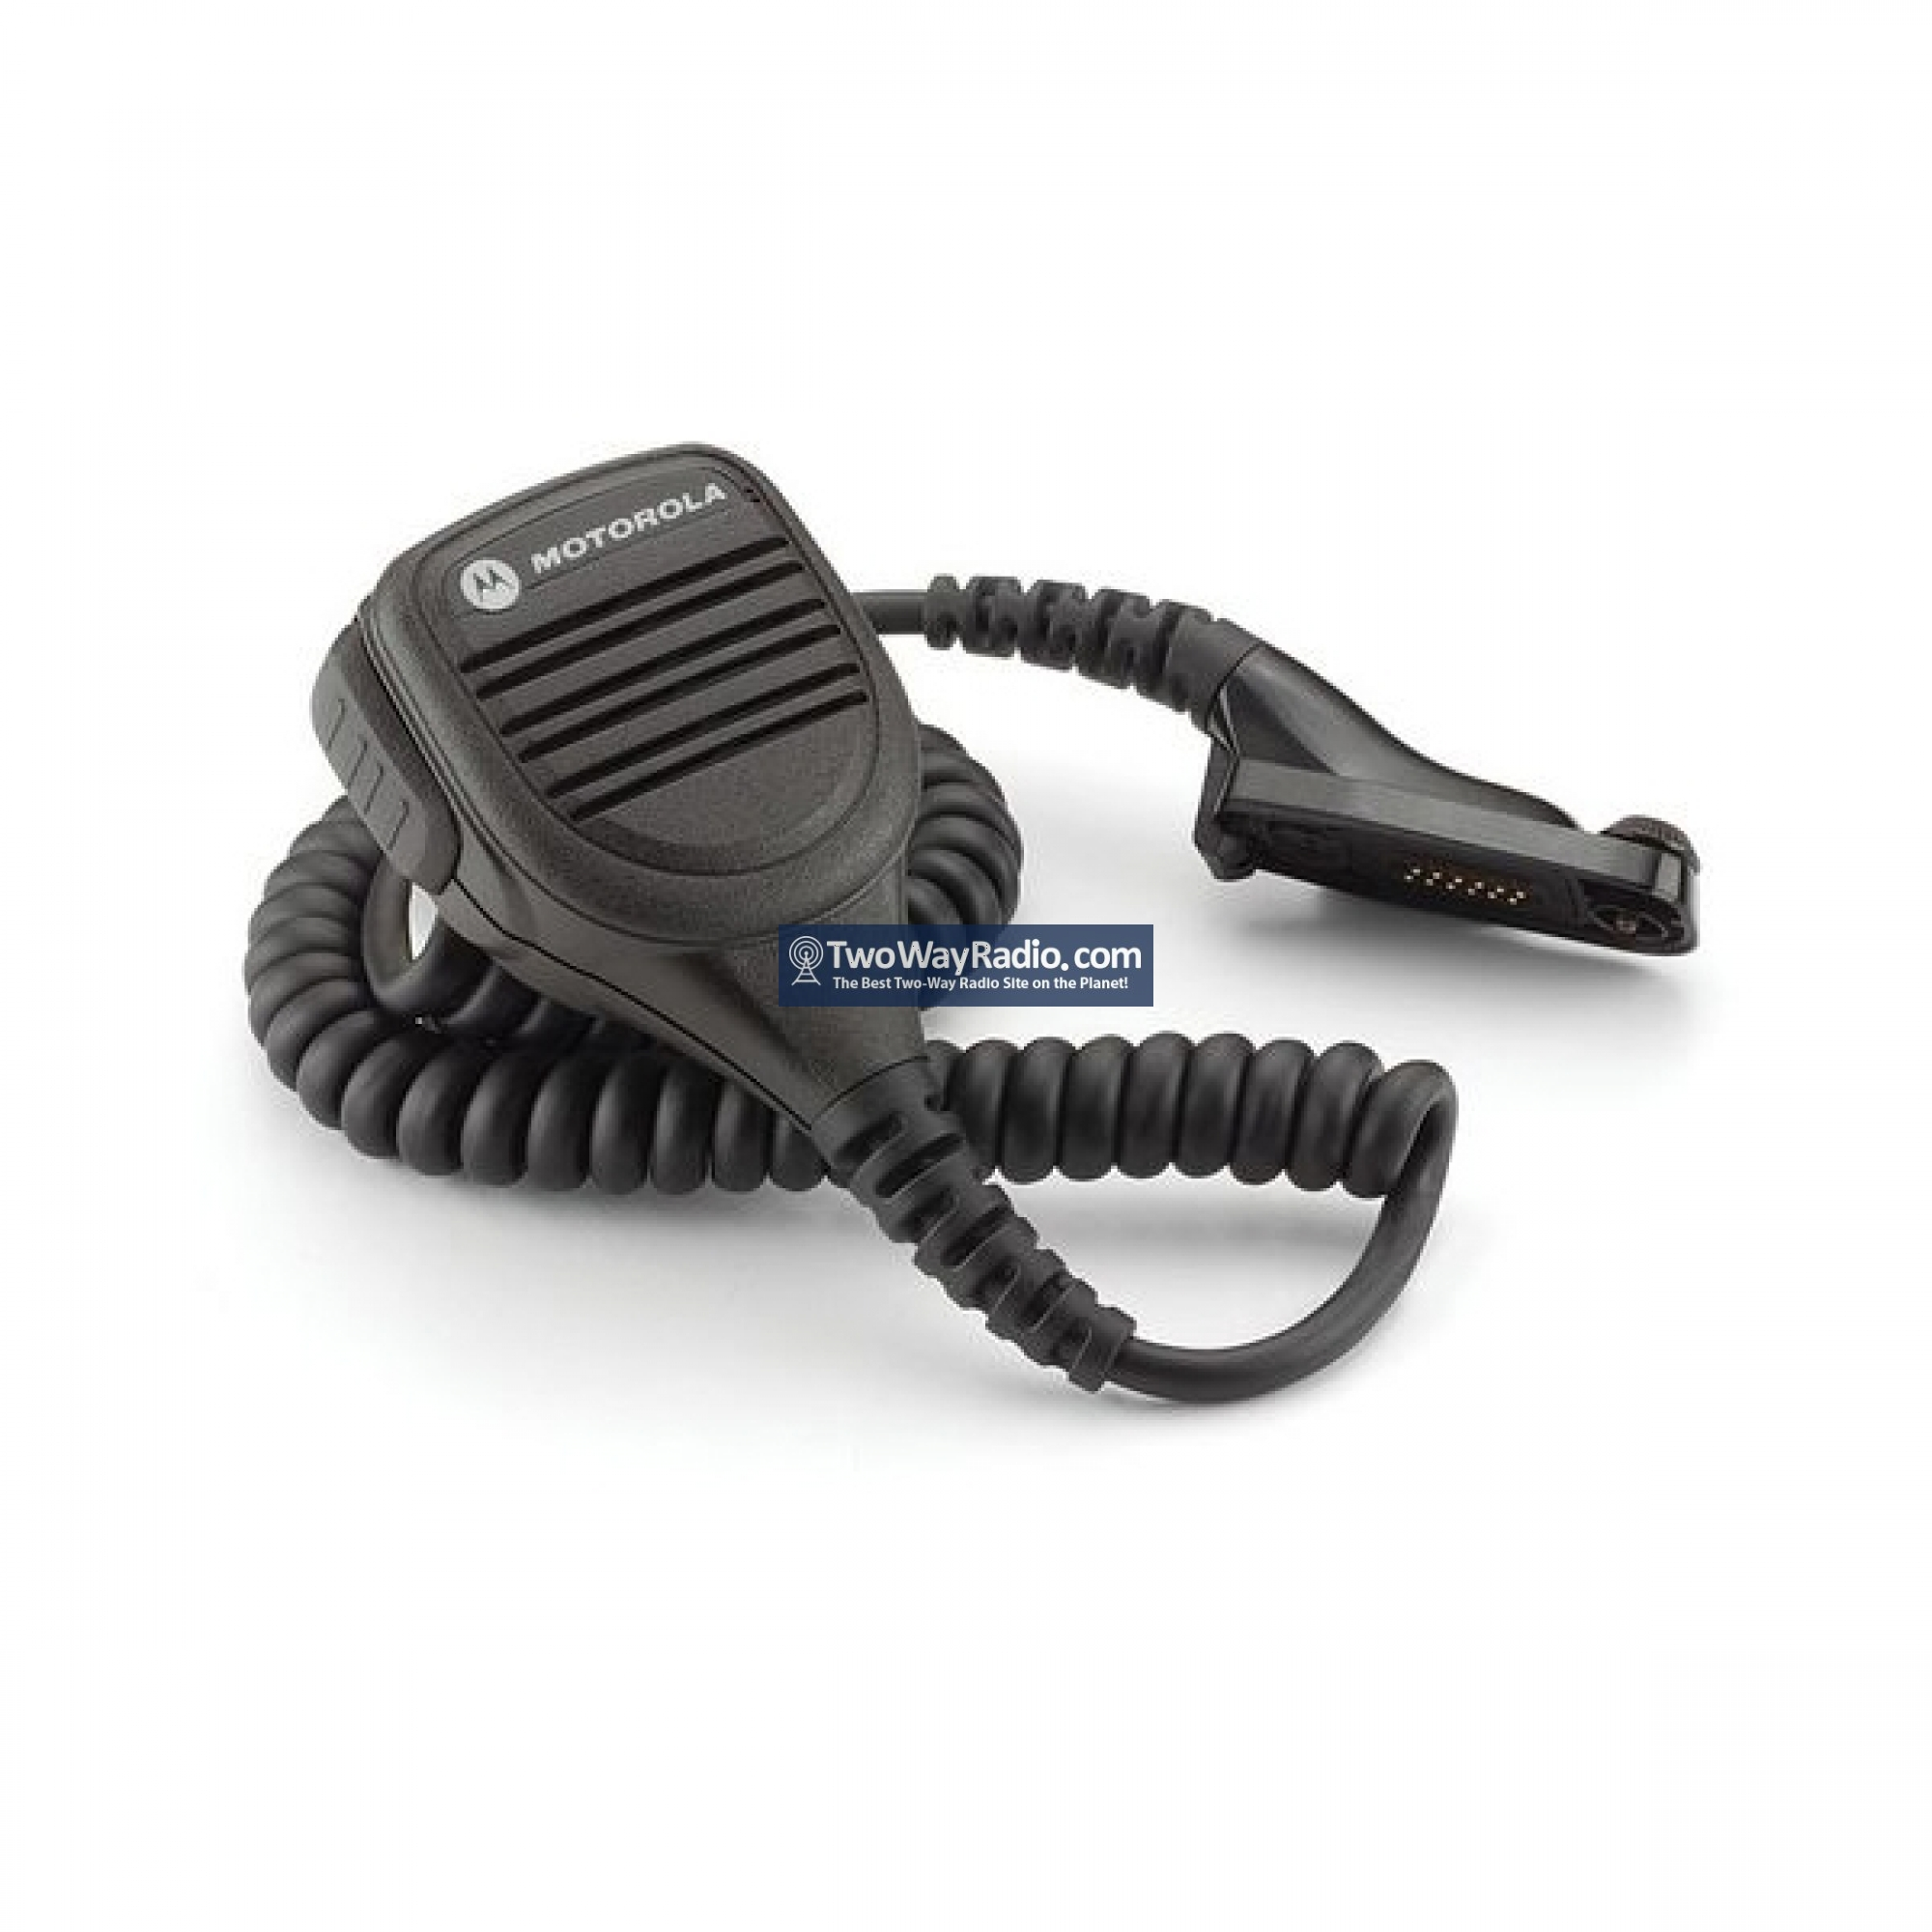 3.5MM RECEIVE ONLY SPEAKER MIC EARPIECE MOTOROLA XPR7550 XPR6580 XPR6550 RADIO